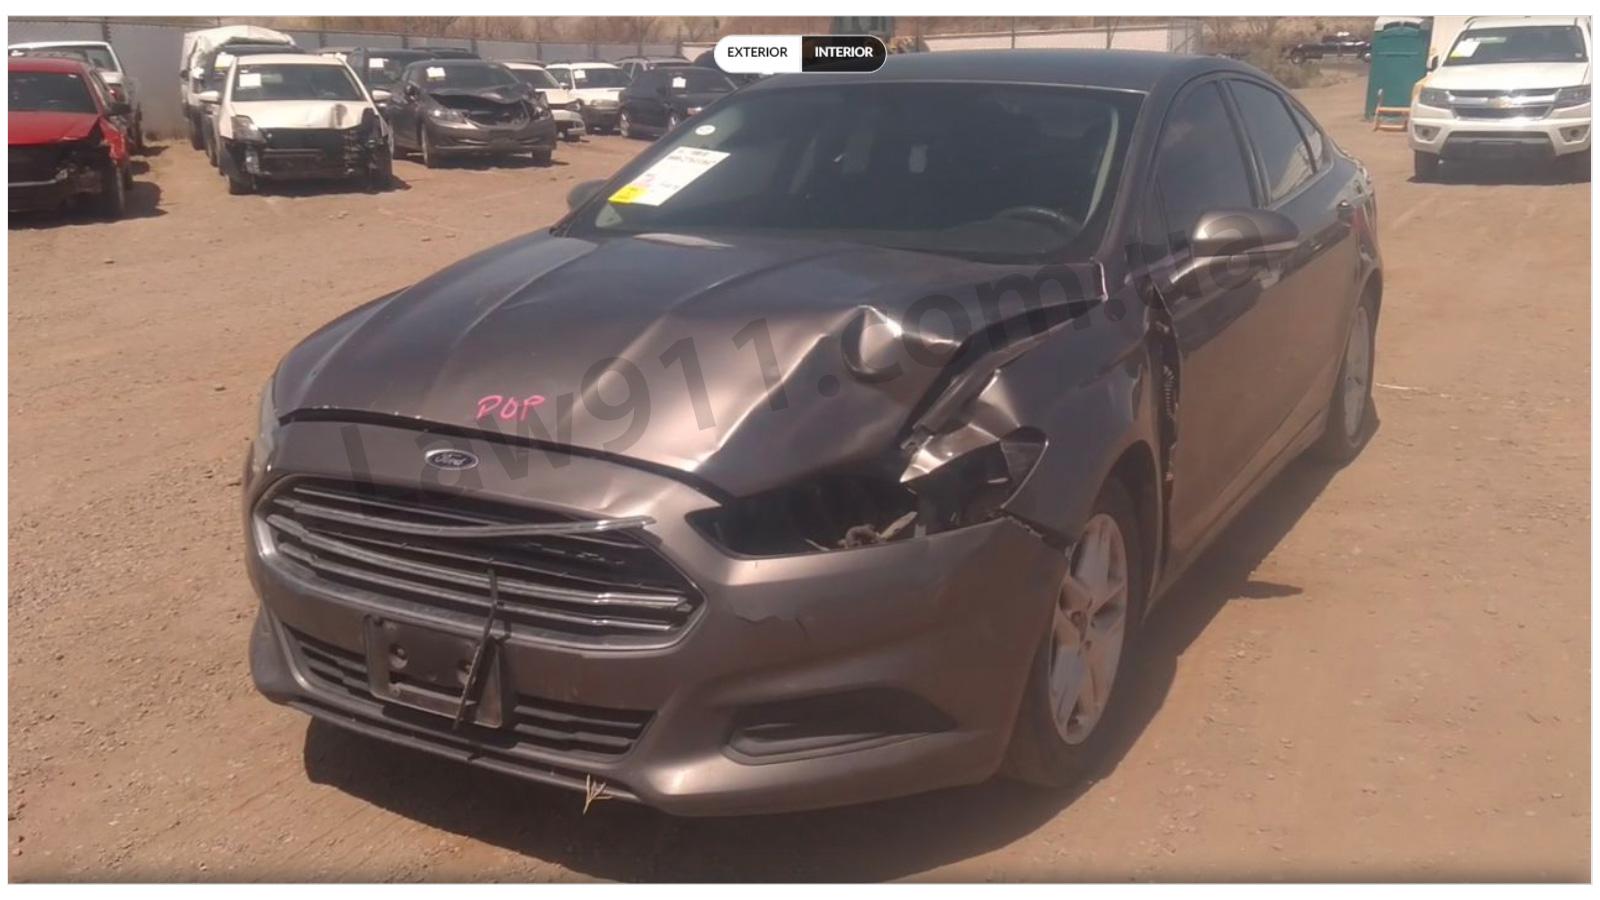 Ford Fusion за 500$ спереду